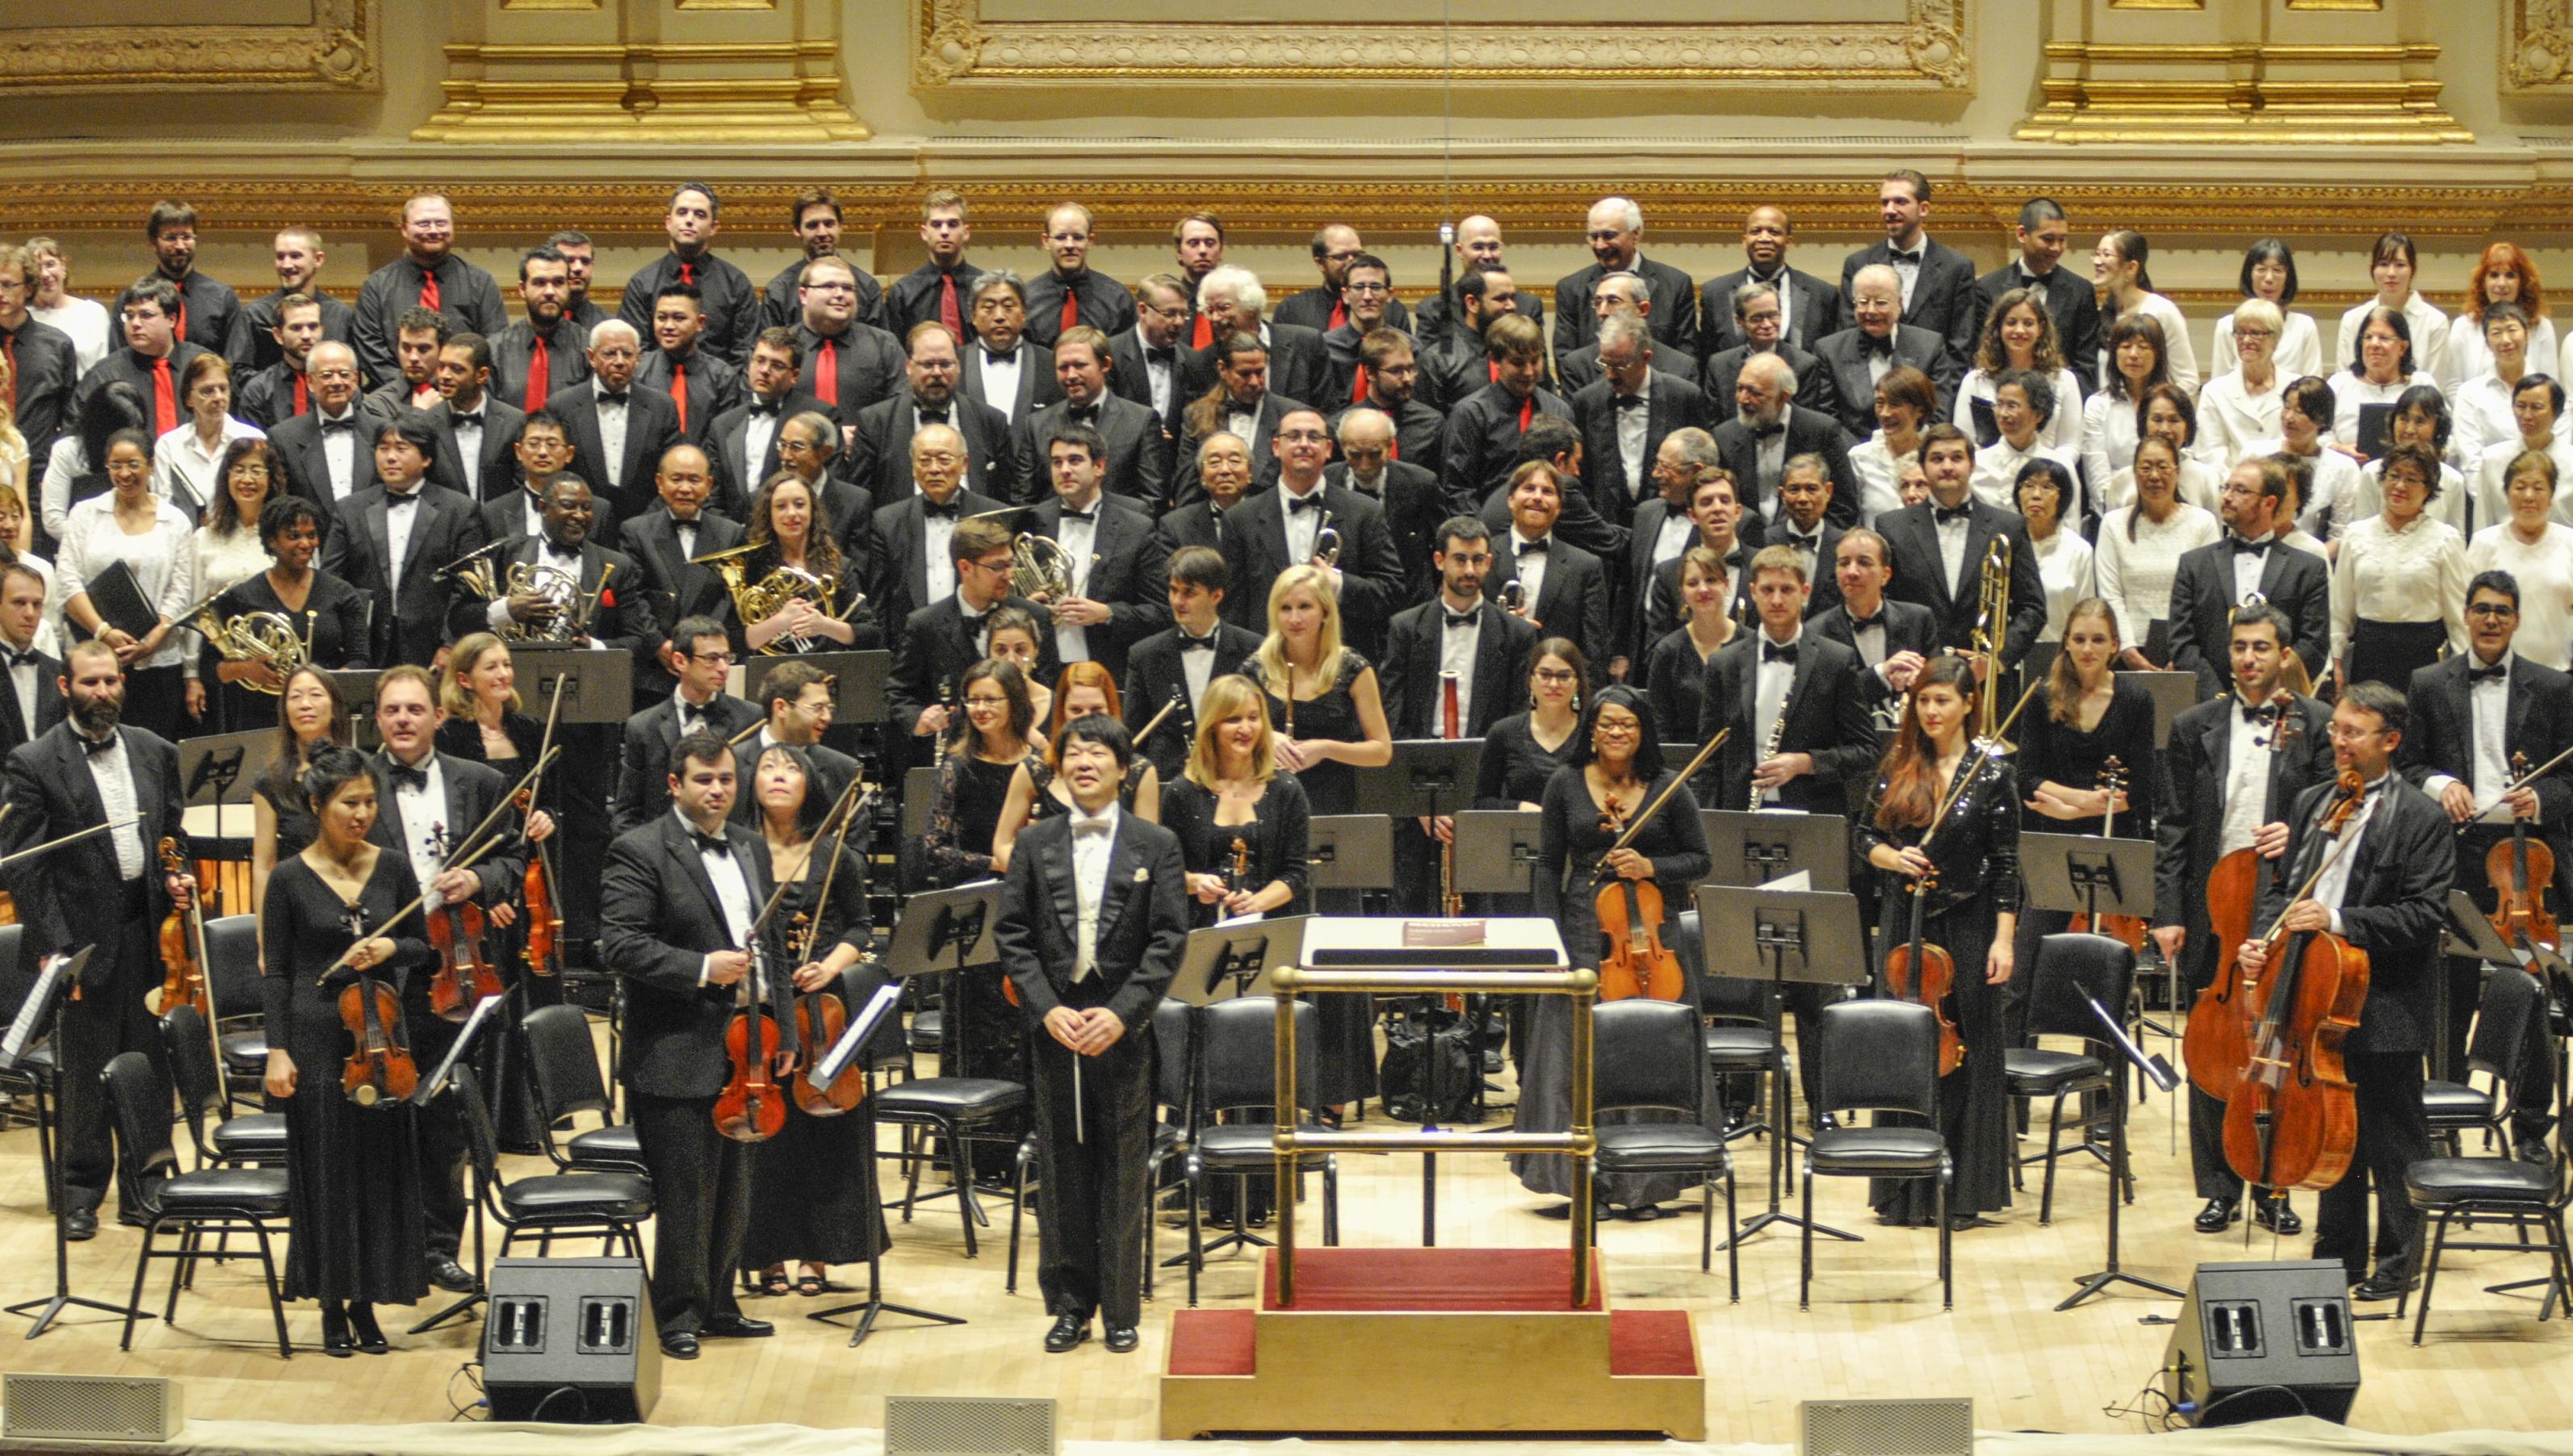 Carnegie Hall_015_2013.12.26_DSC8124_trimmed.JPG